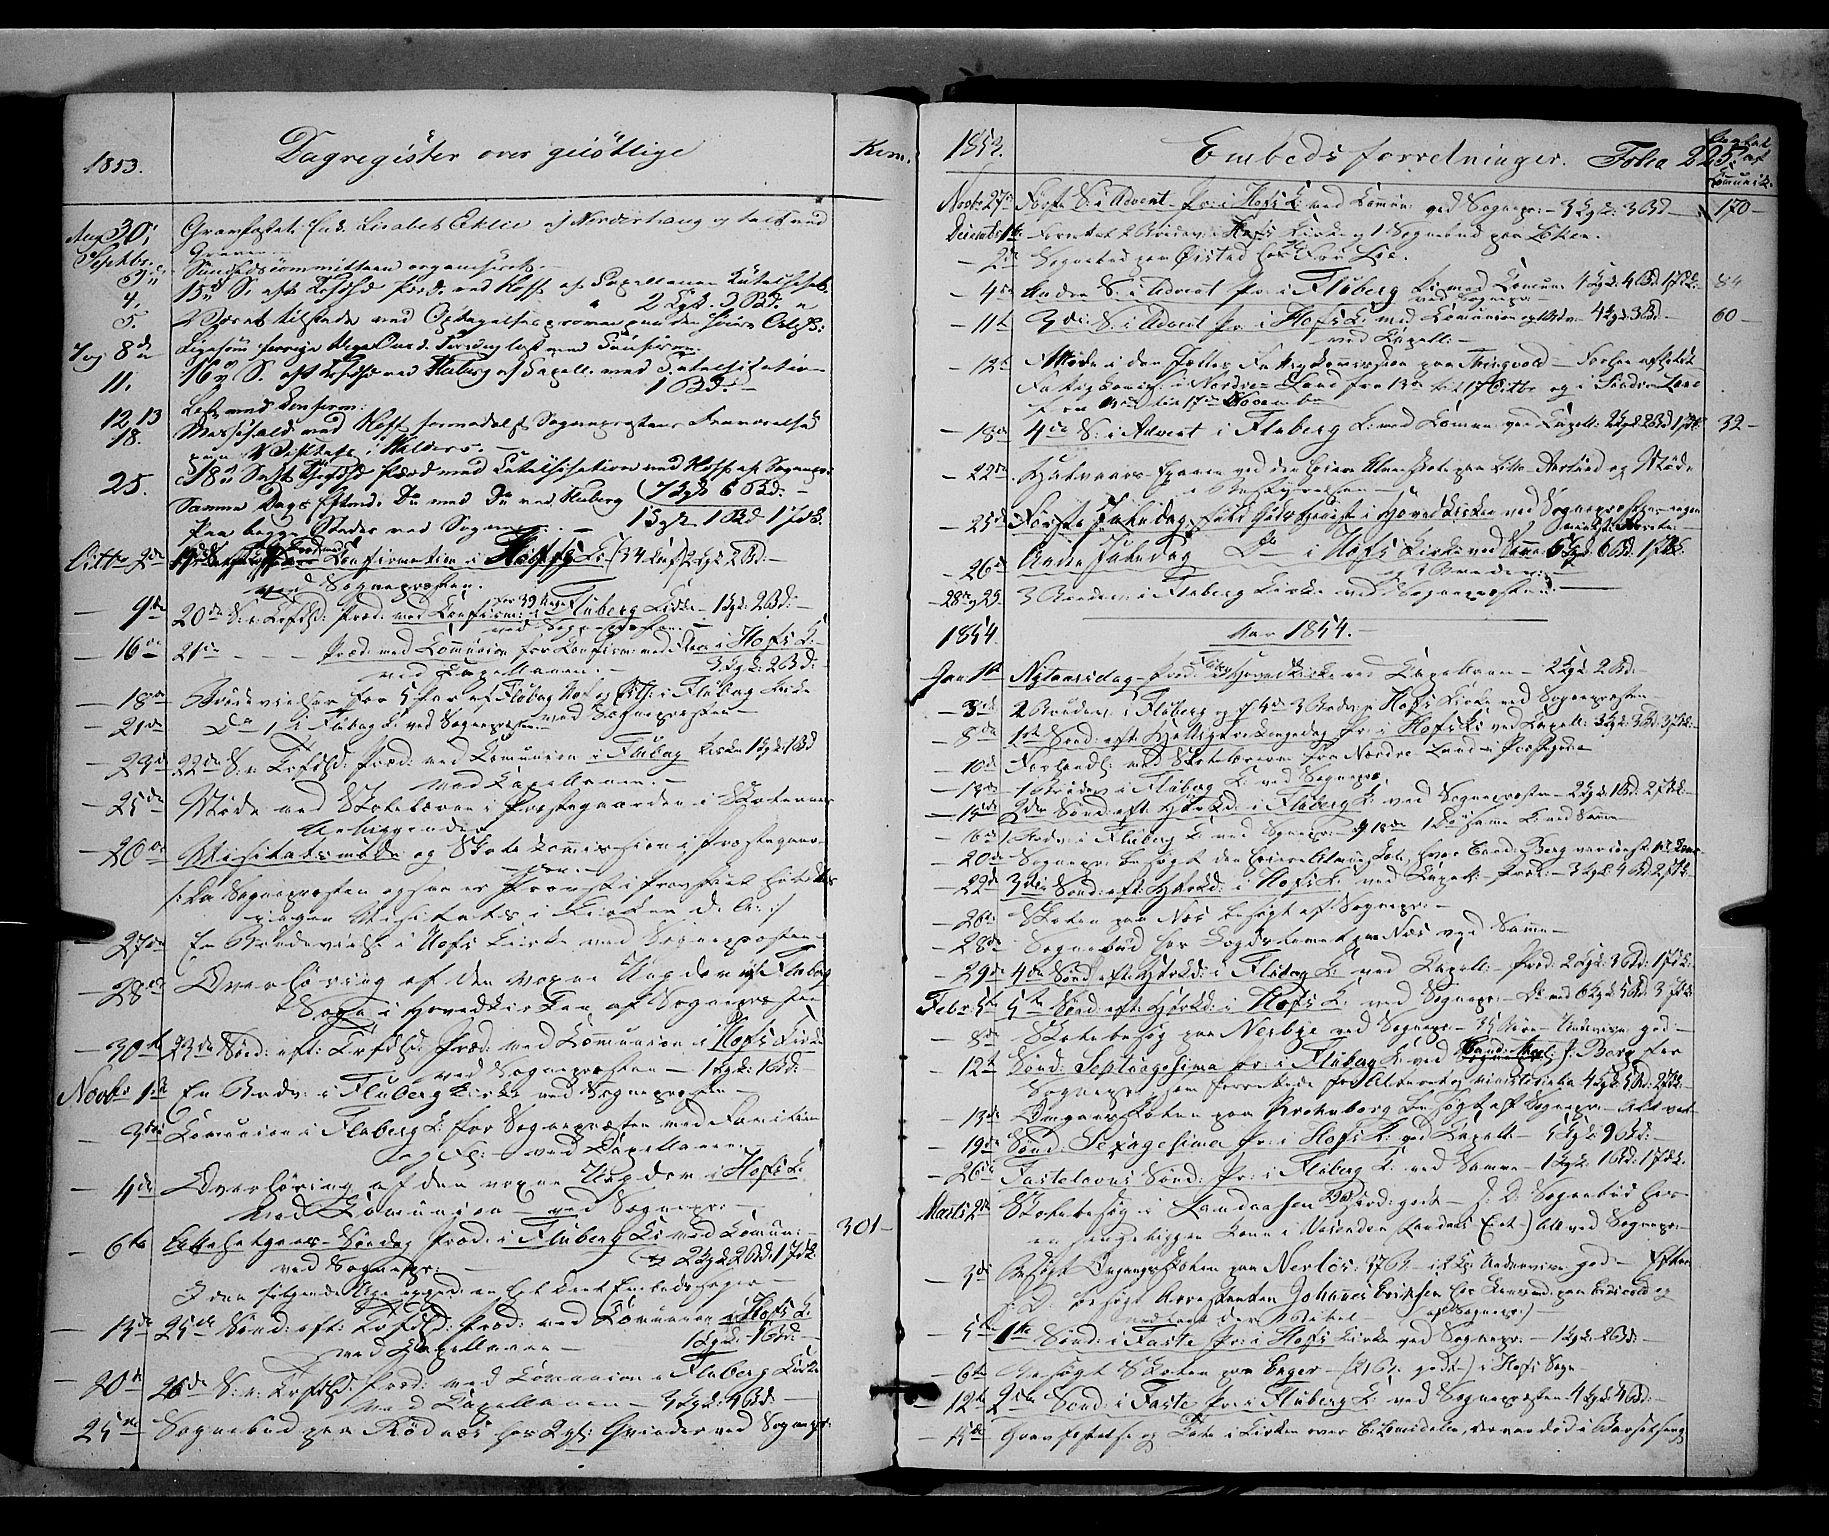 SAH, Land prestekontor, Ministerialbok nr. 9, 1847-1859, s. 225